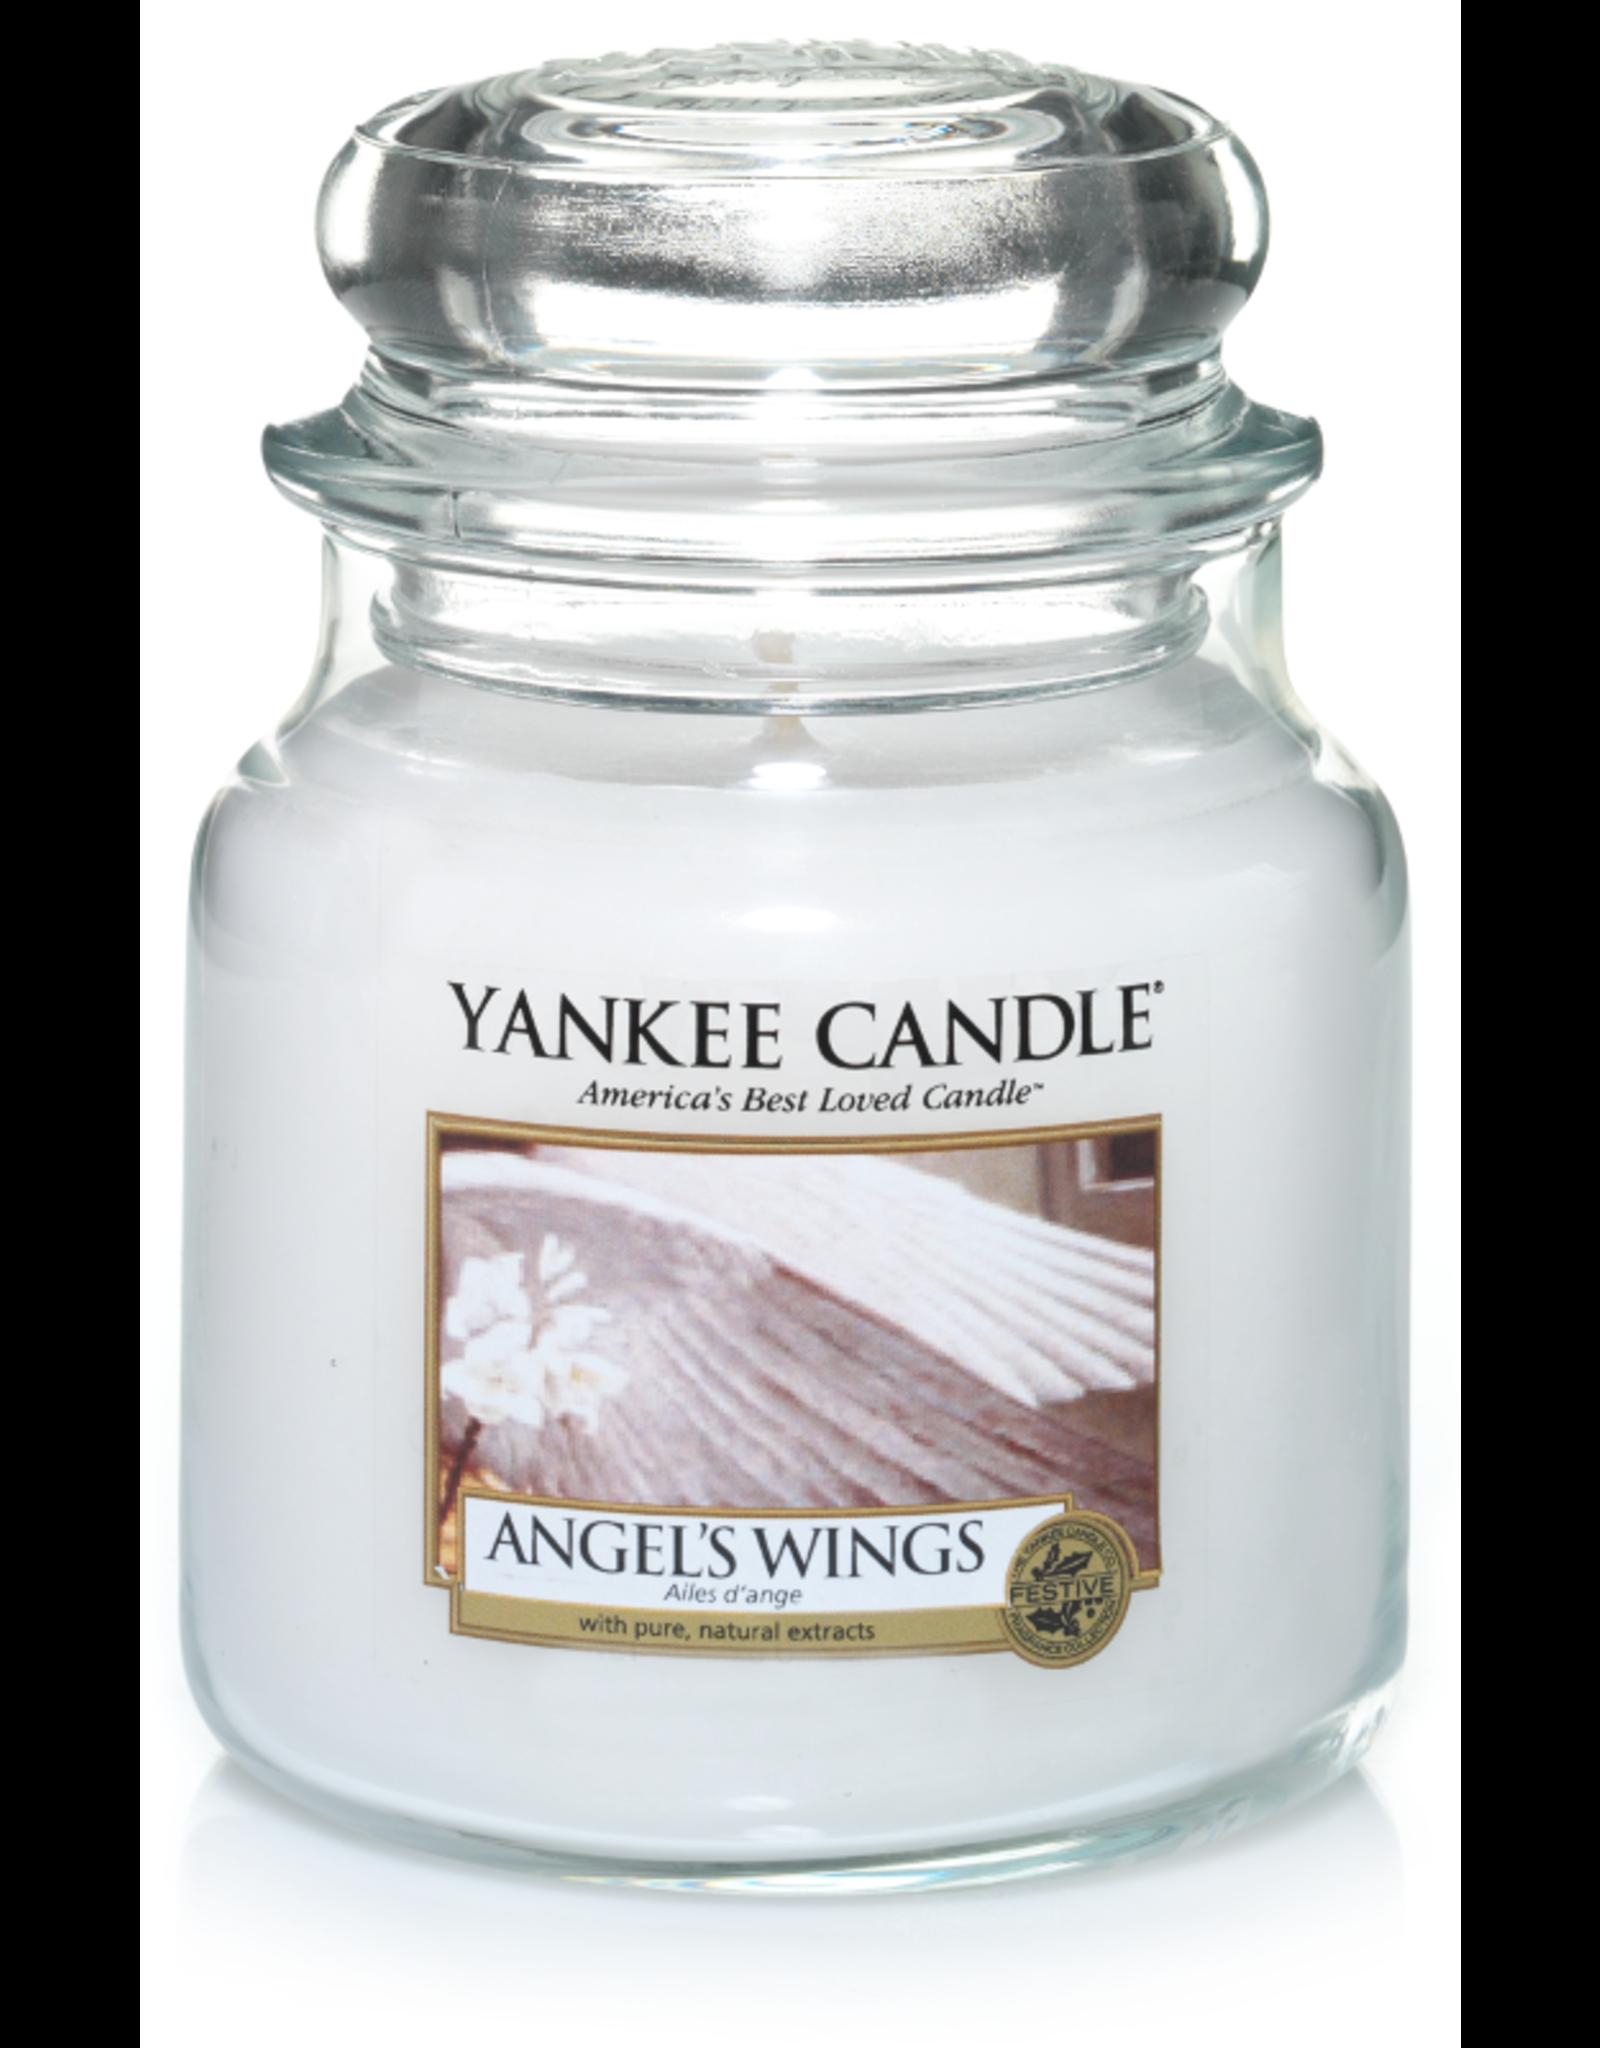 Yankee Candle Angels Wings Yankee Candle Medium